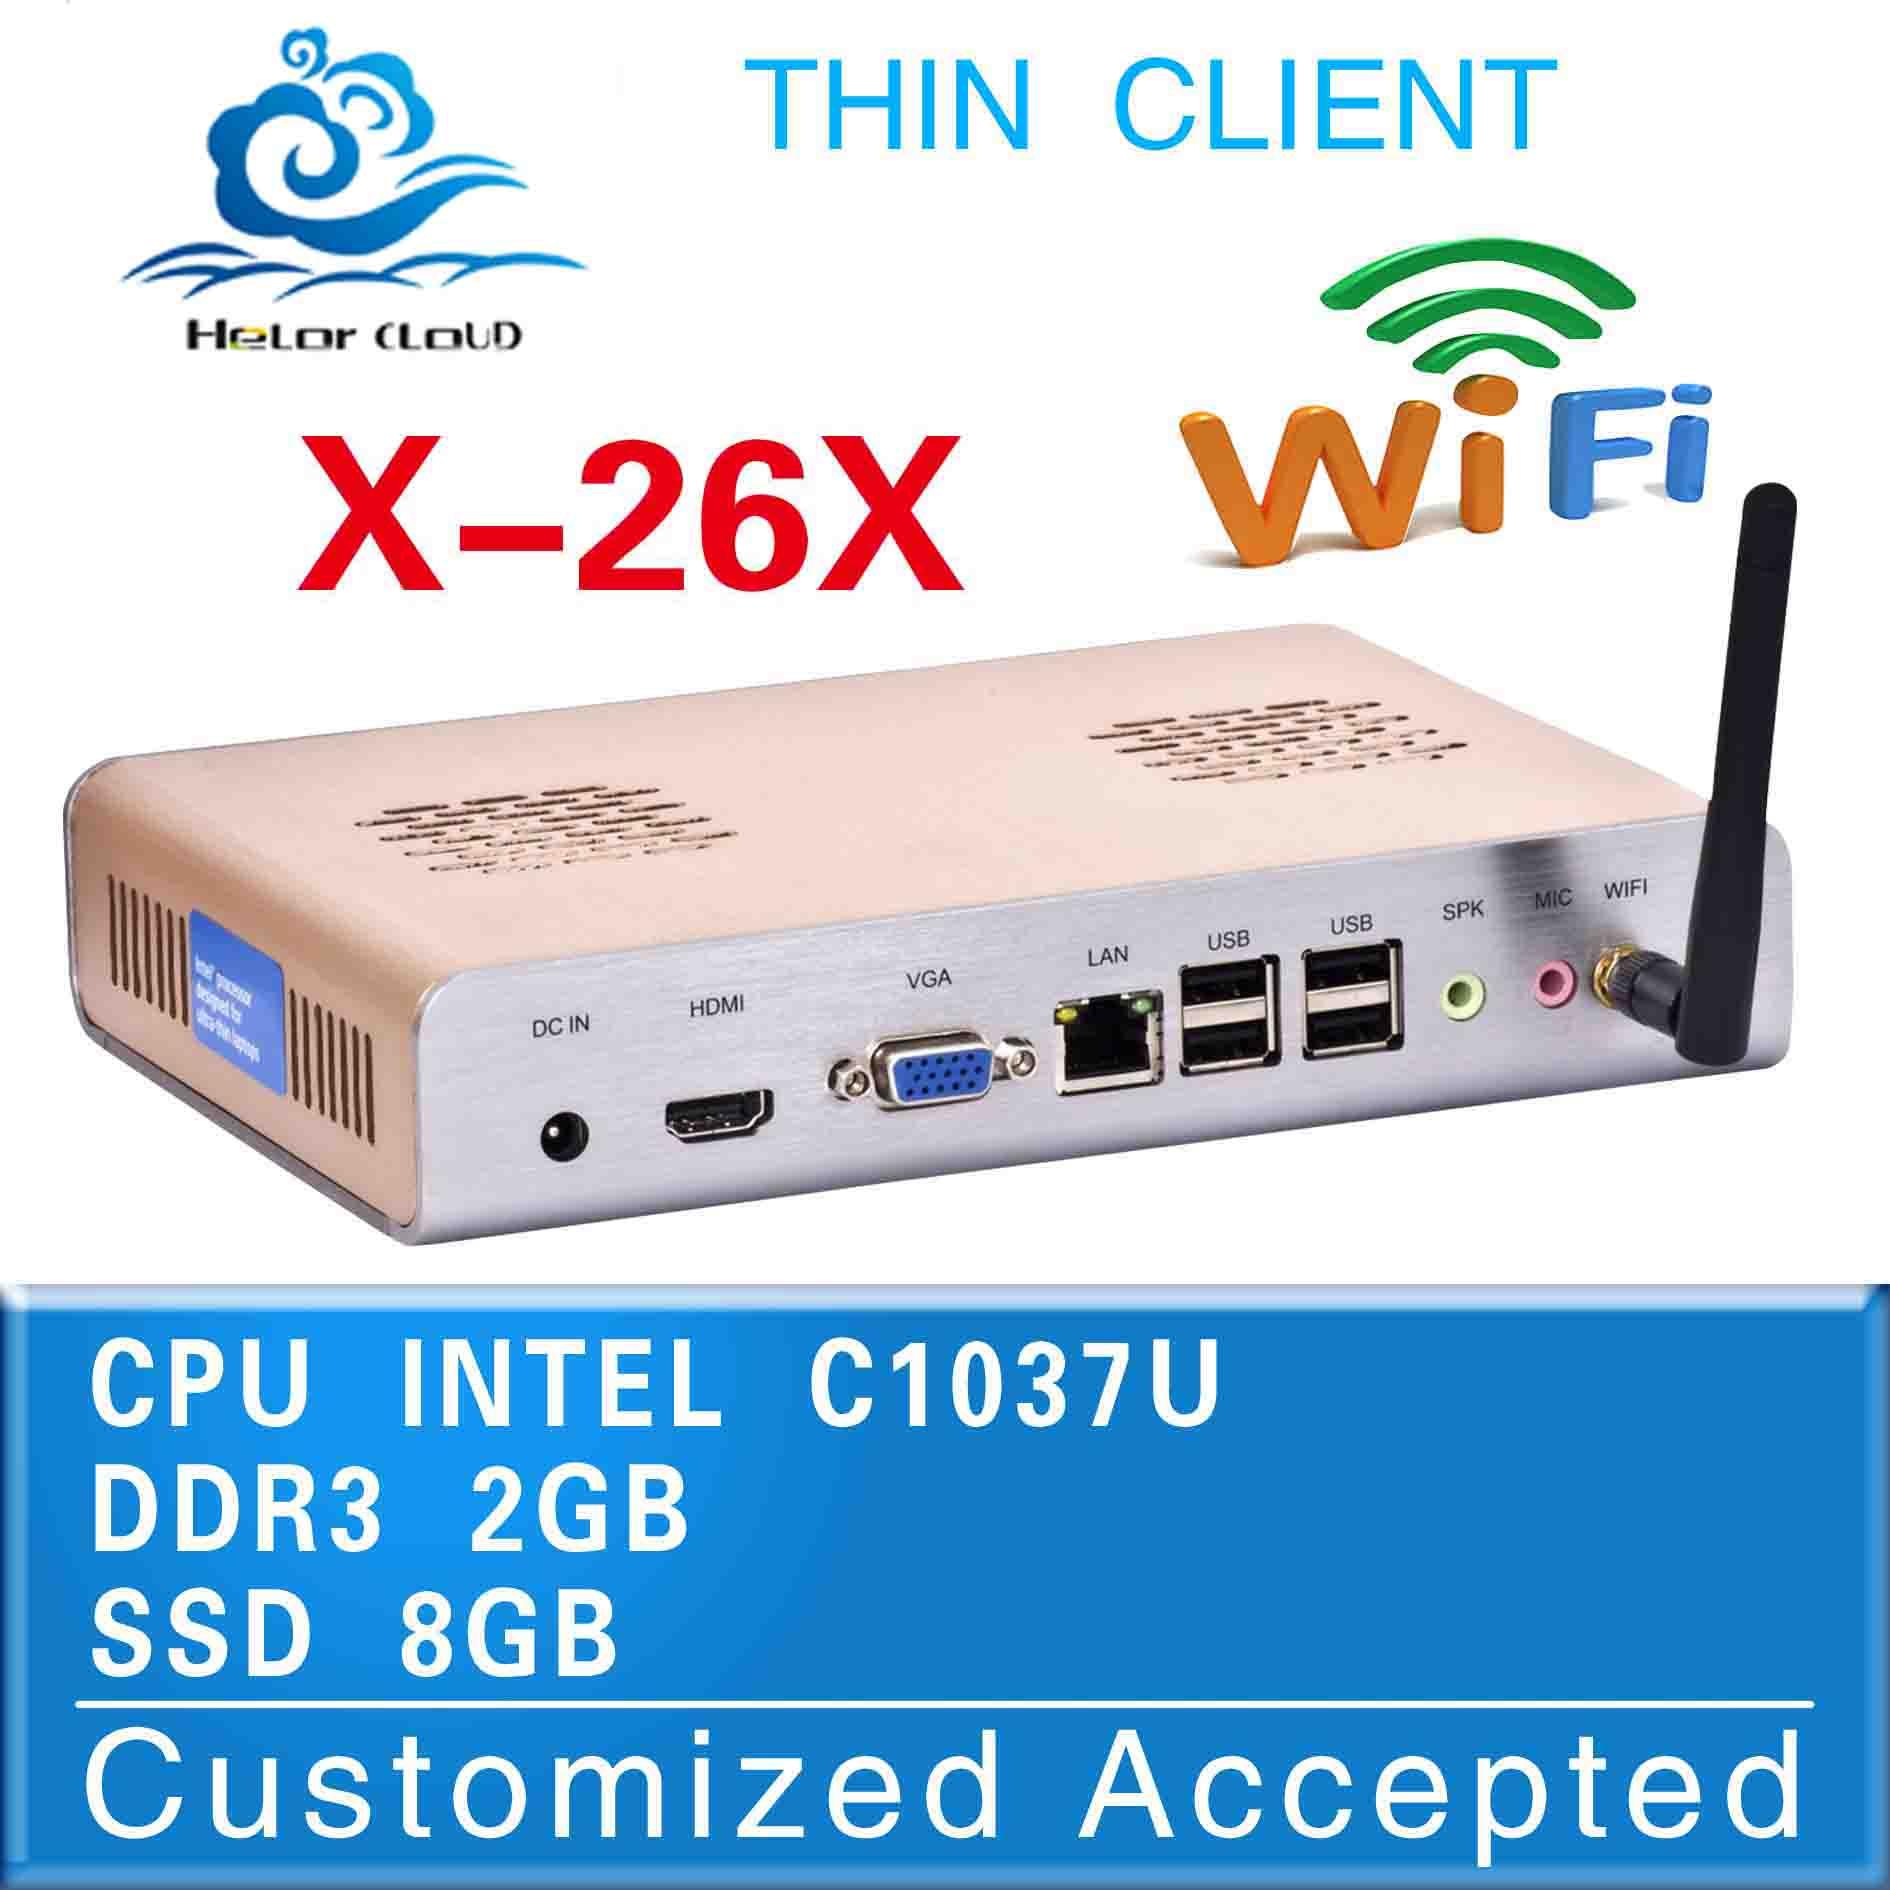 Embedded PC INTEL C1037U (1.8GHZ Frequency) Dual-core ultra small pc mini pc desktop Touchscreen Trackball(China (Mainland))